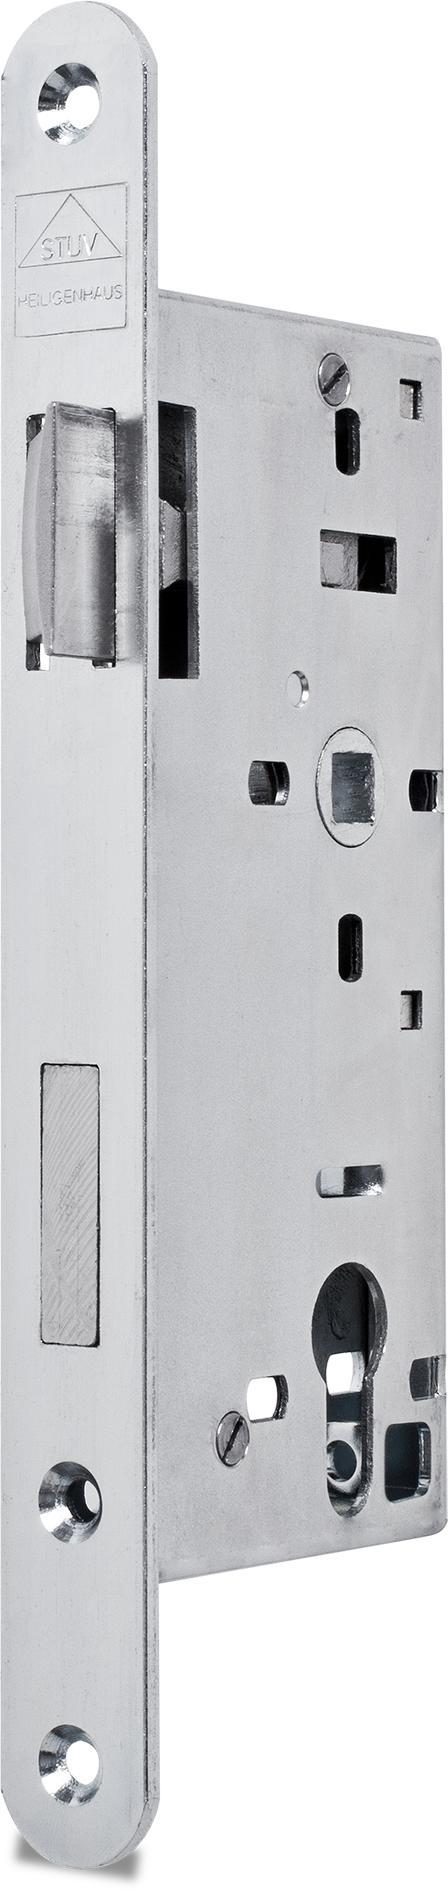 Einsteckschloss mit Wechsel, Dornmaß 50 mm, Entfernung 72 mm, Vierkantnuss 9 mm, Falle und Riegel bündig, DIN rechts (Falle nach Öffnen des Schlosses umlegbar)